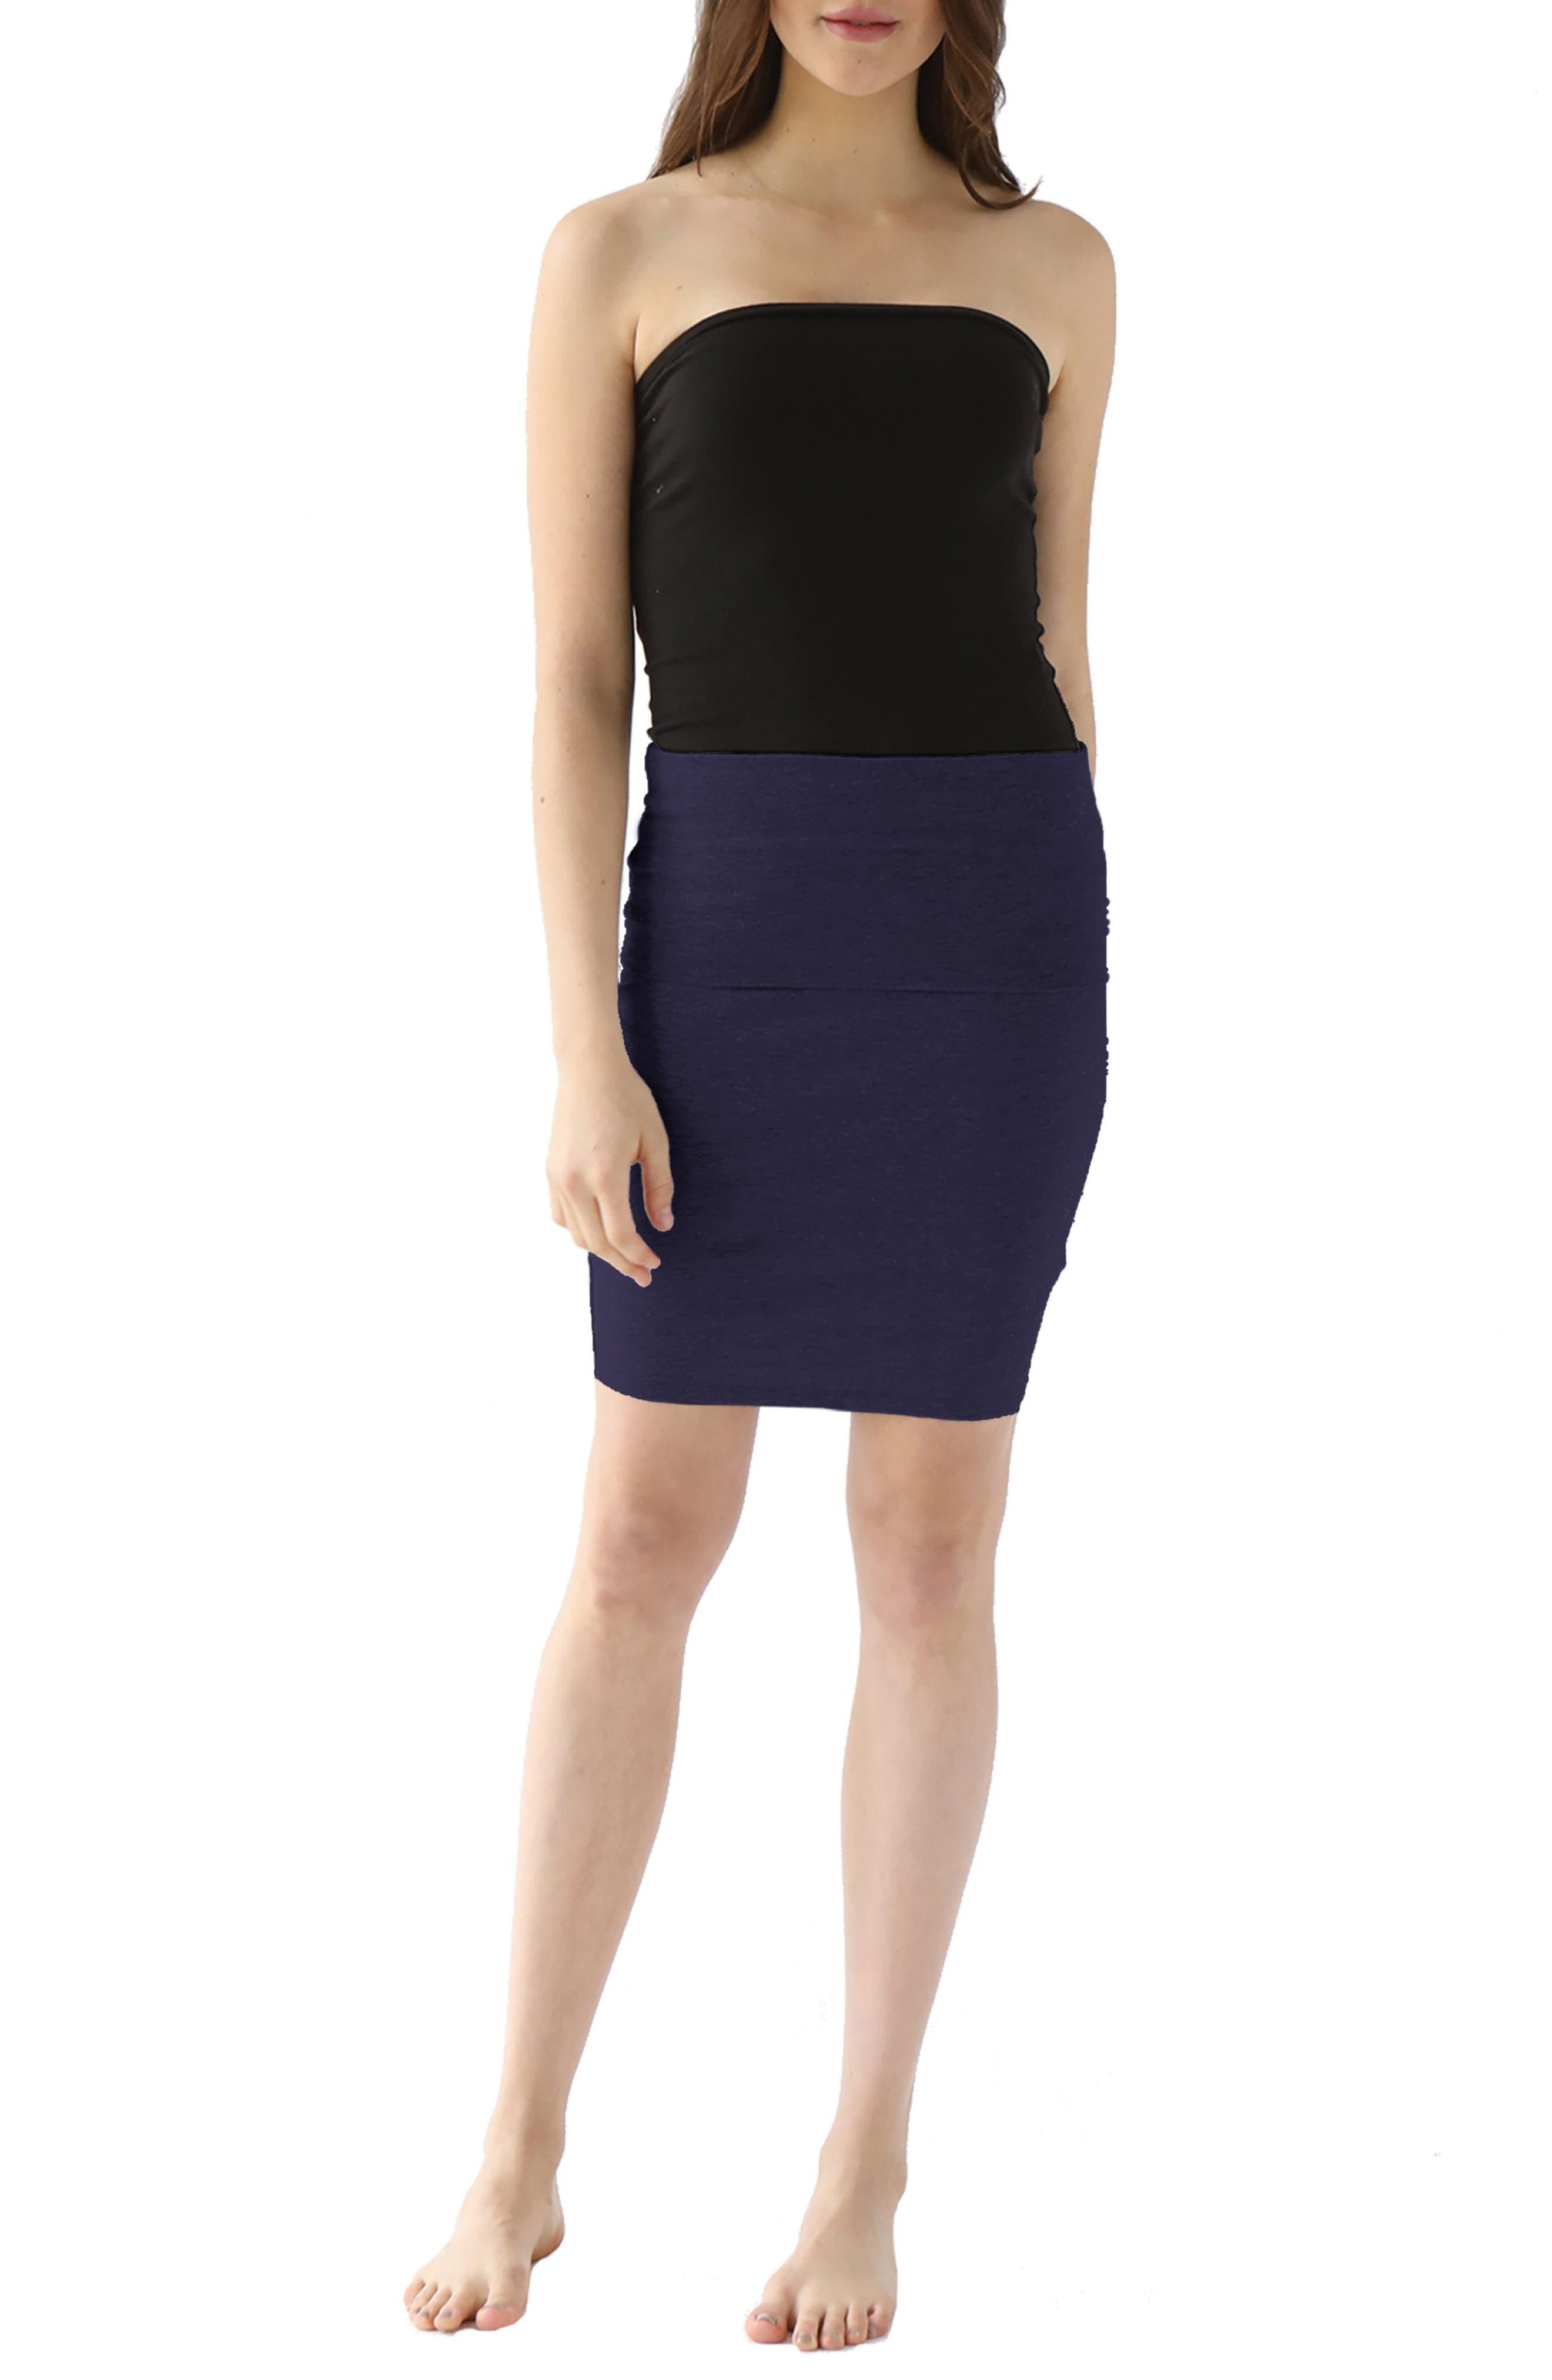 Trina Foldover Stretch Cotton Skirt,                         Main,                         color, Midnight